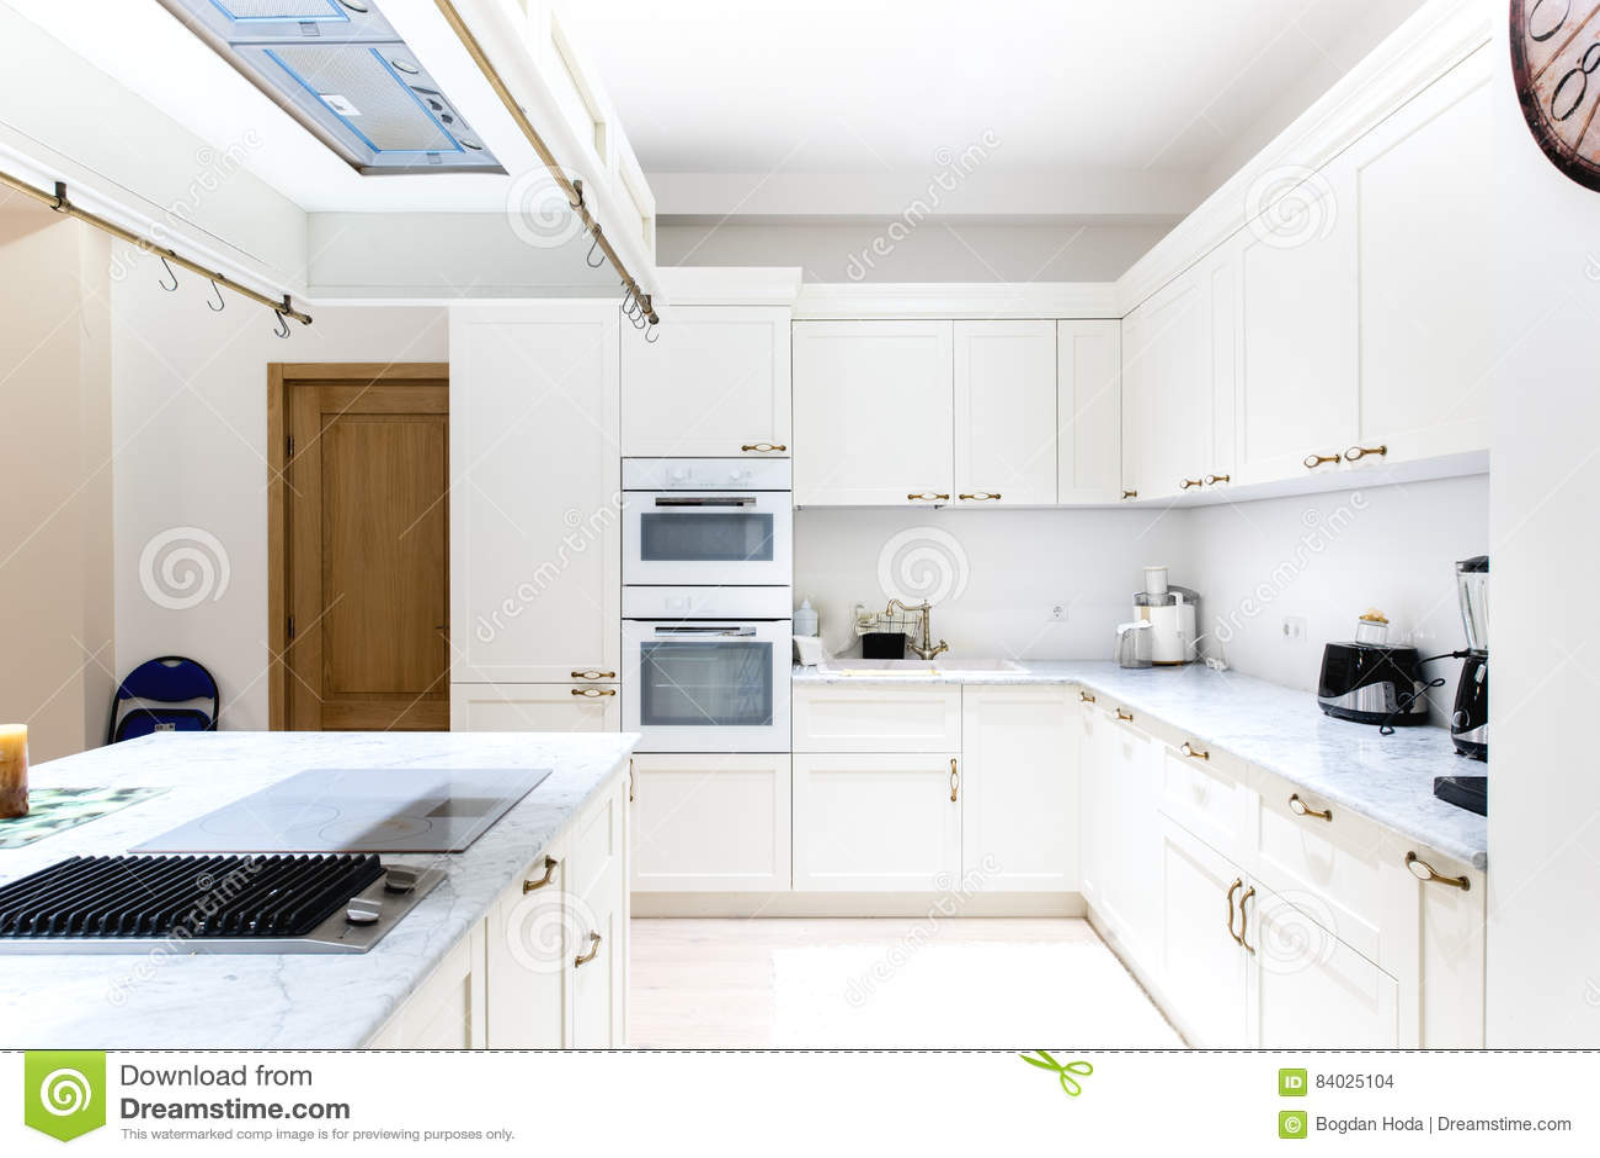 Luxurious Modern Kitchen White Cabinets Of Wooden Furniture